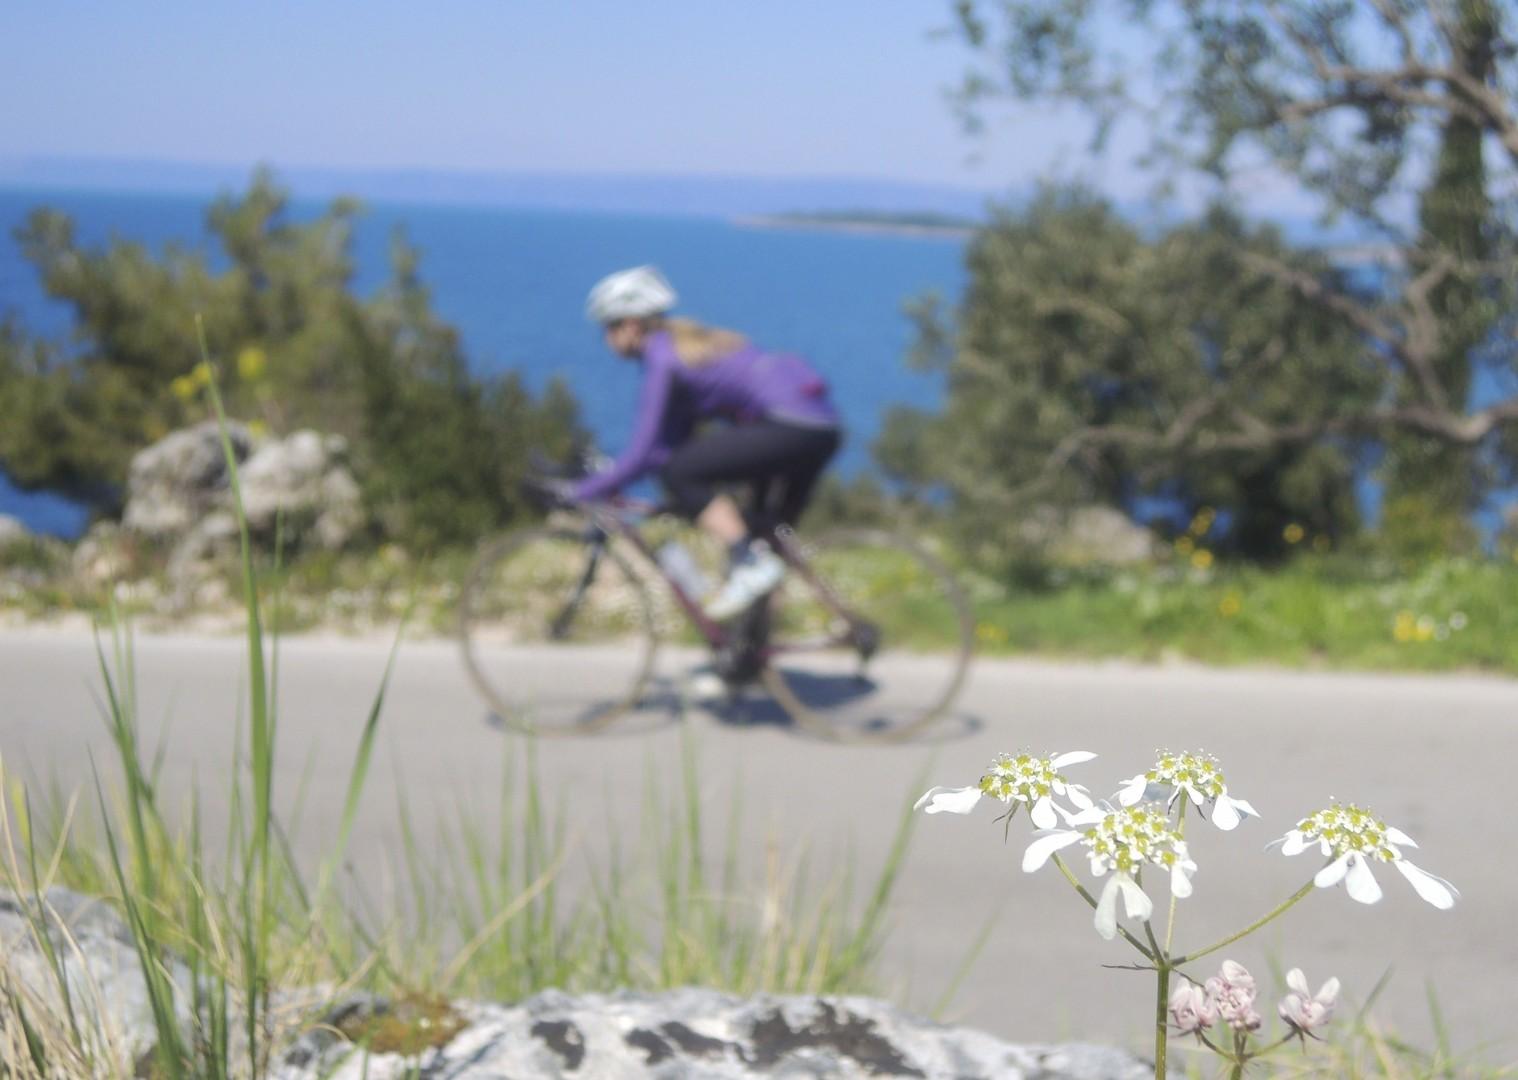 croatiaroad7.jpg - Slovenia and Croatia - Slovenian Alps to Dalmatian Coast - Guided Road Cycling Holiday - Road Cycling